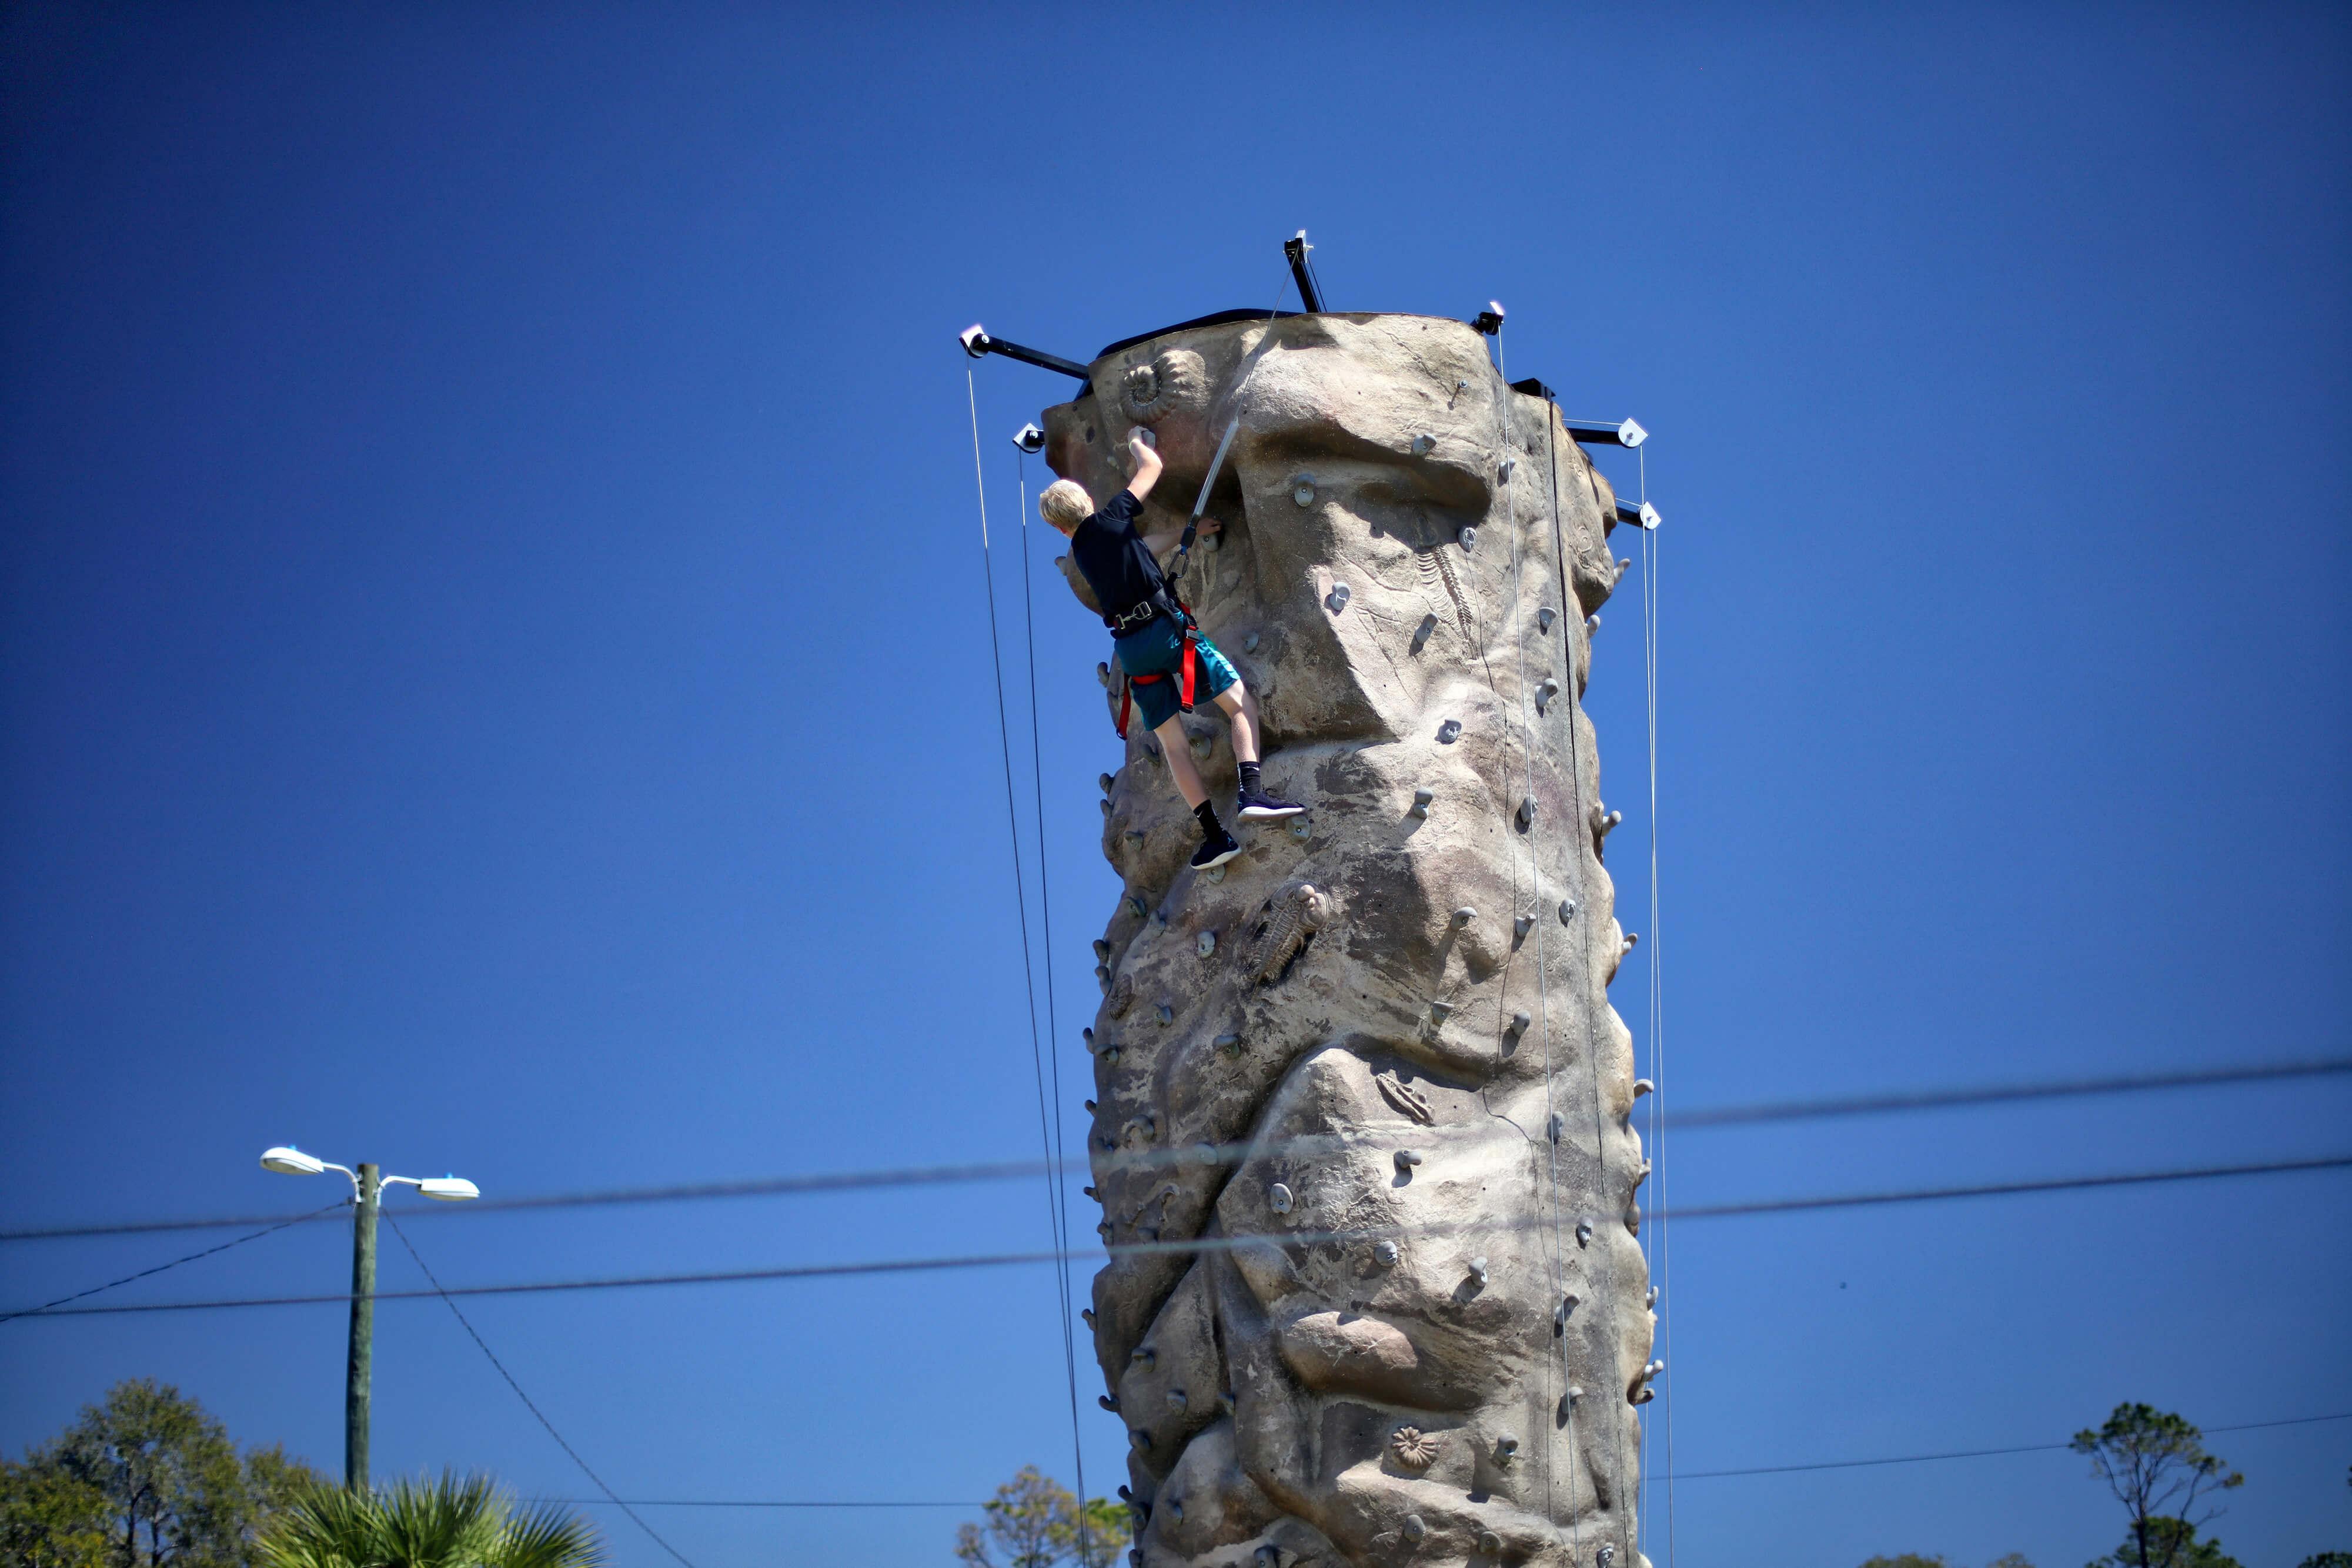 Rock Climbing Challenge Near Orlando, FL |  Westgate River Ranch Resort & Rodeo | Westgate Resorts